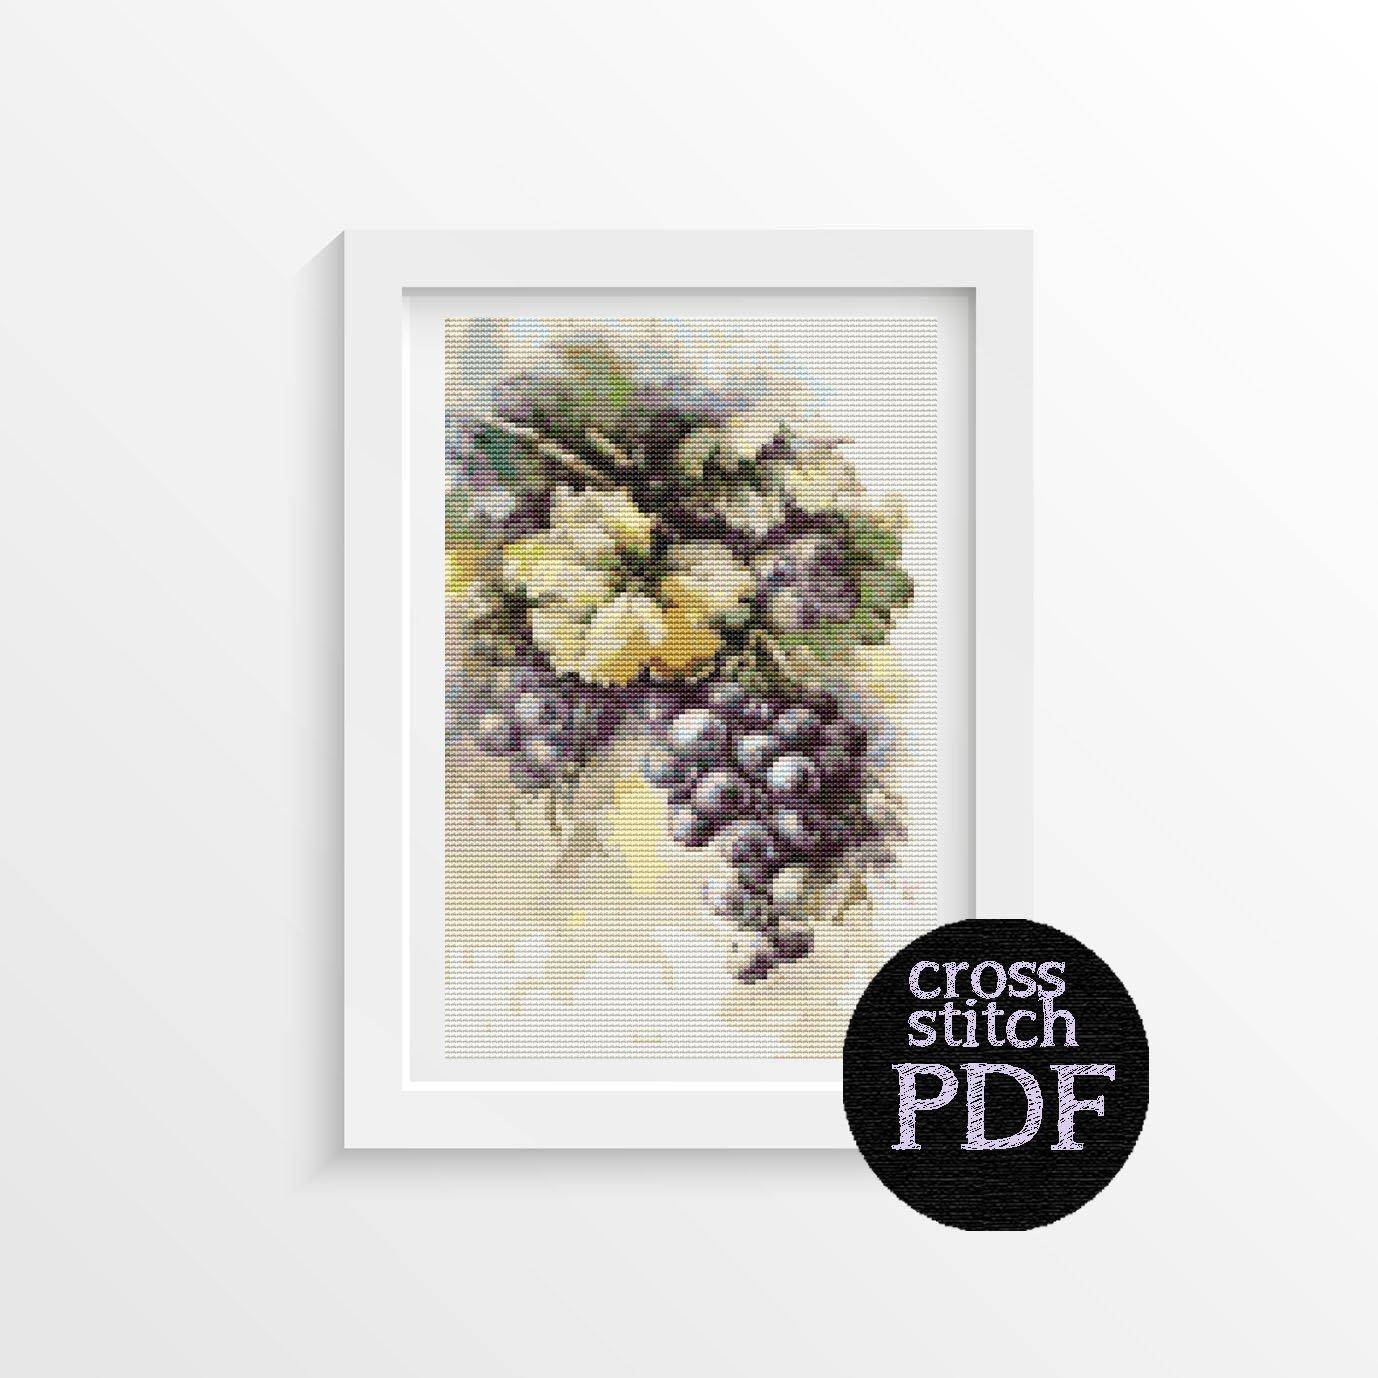 Grapes Cross Stitch Pattern PDF by Catherine Klein